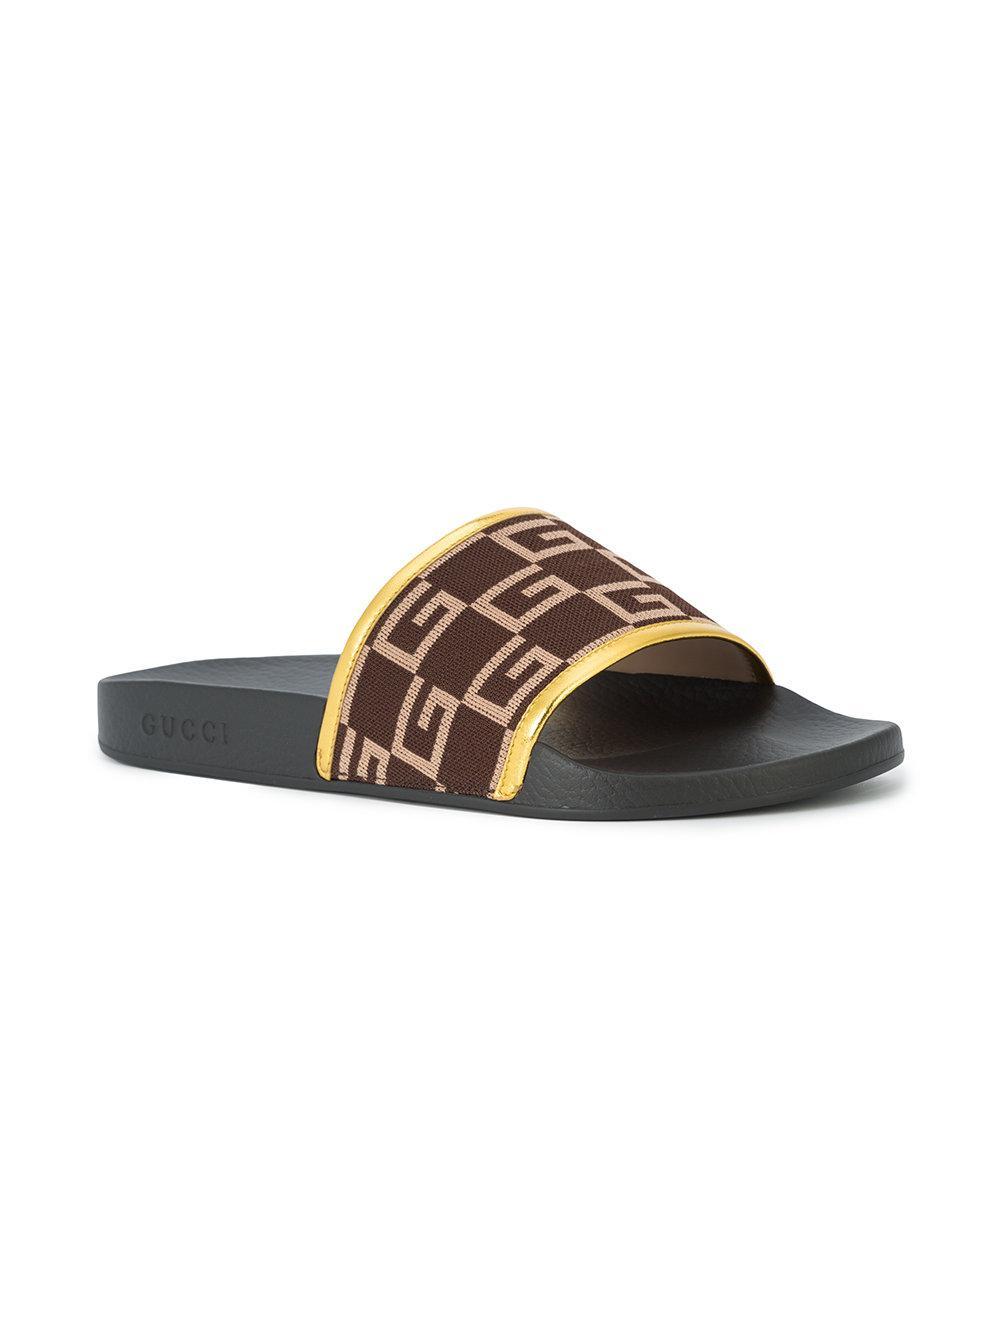 b22f90952eab Lyst - Gucci G Print Shower Slides in Black for Men